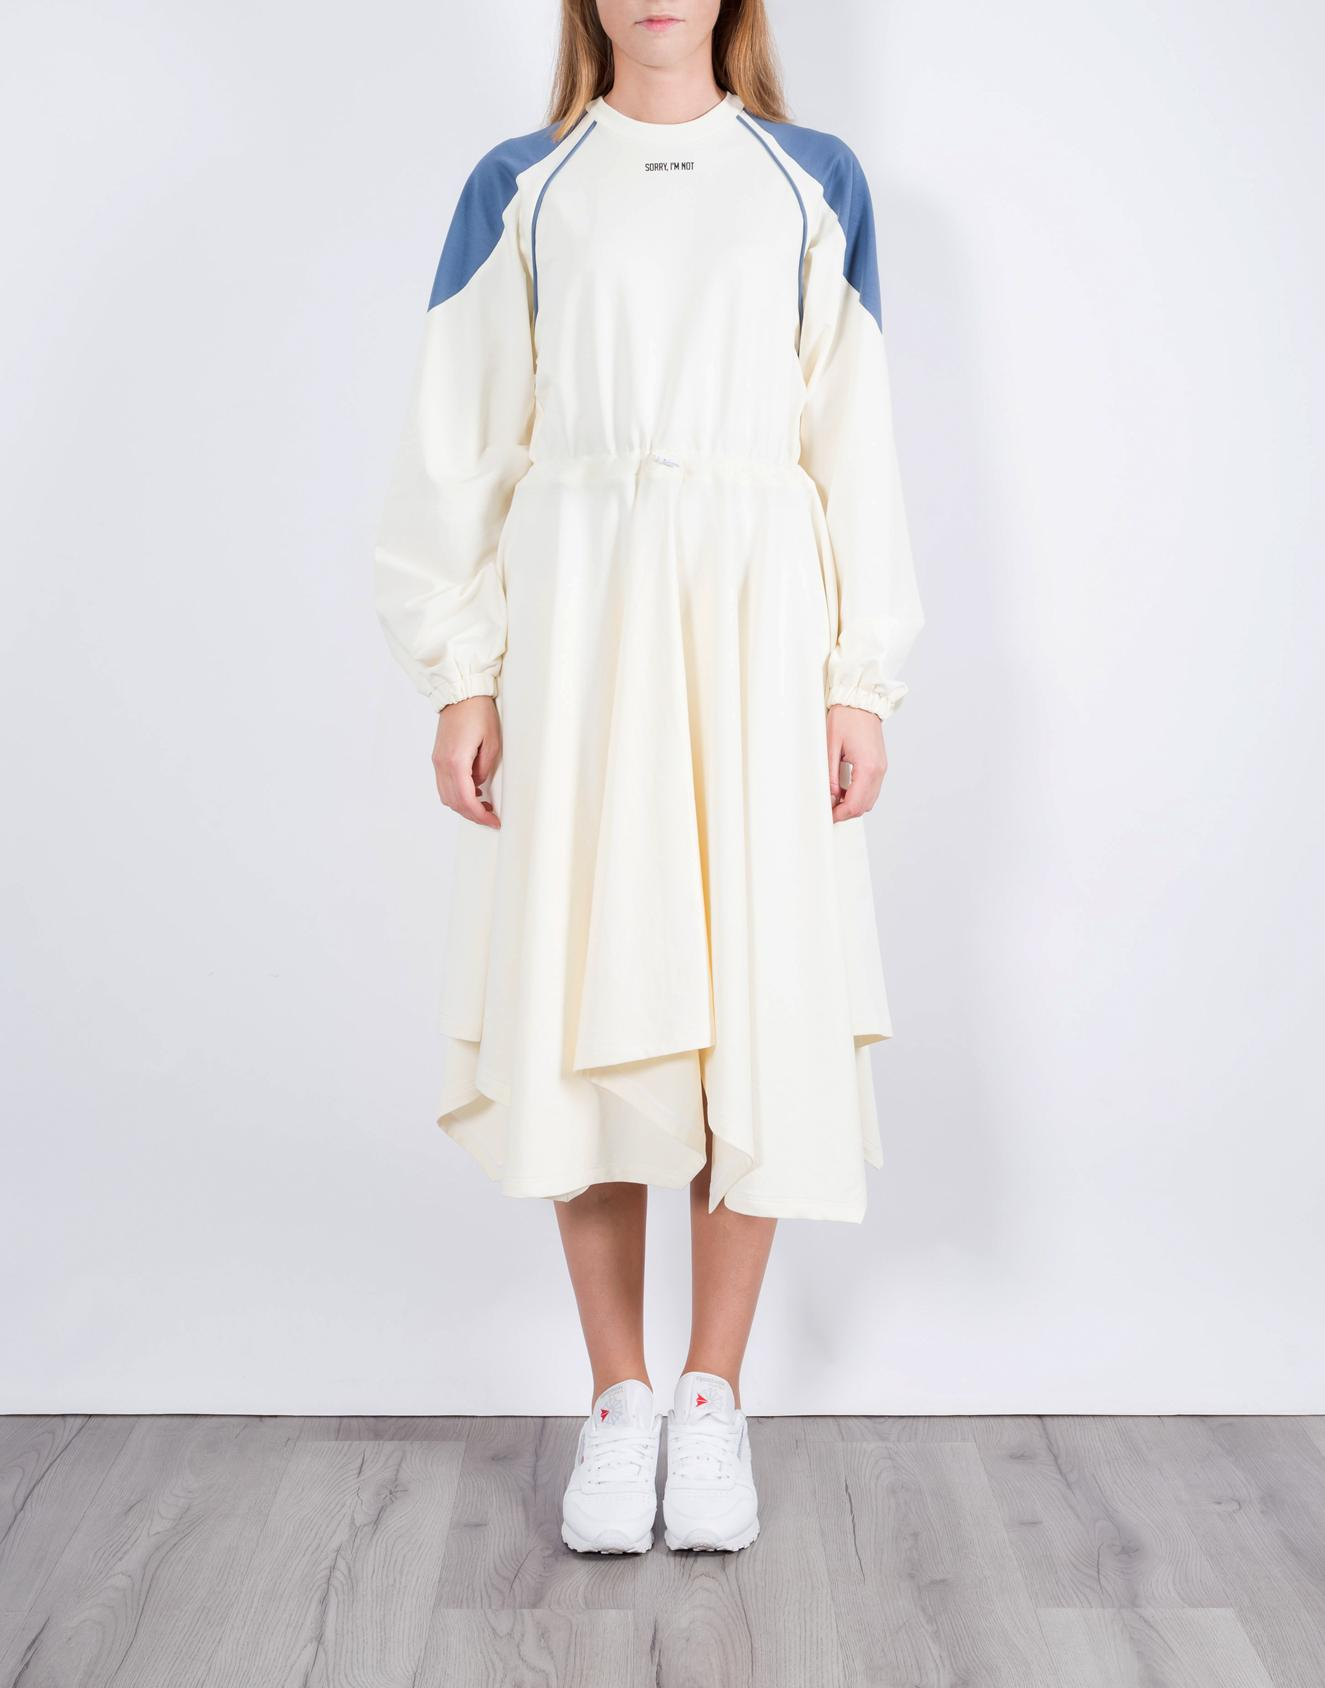 BLUE SHOULDERS DRESS